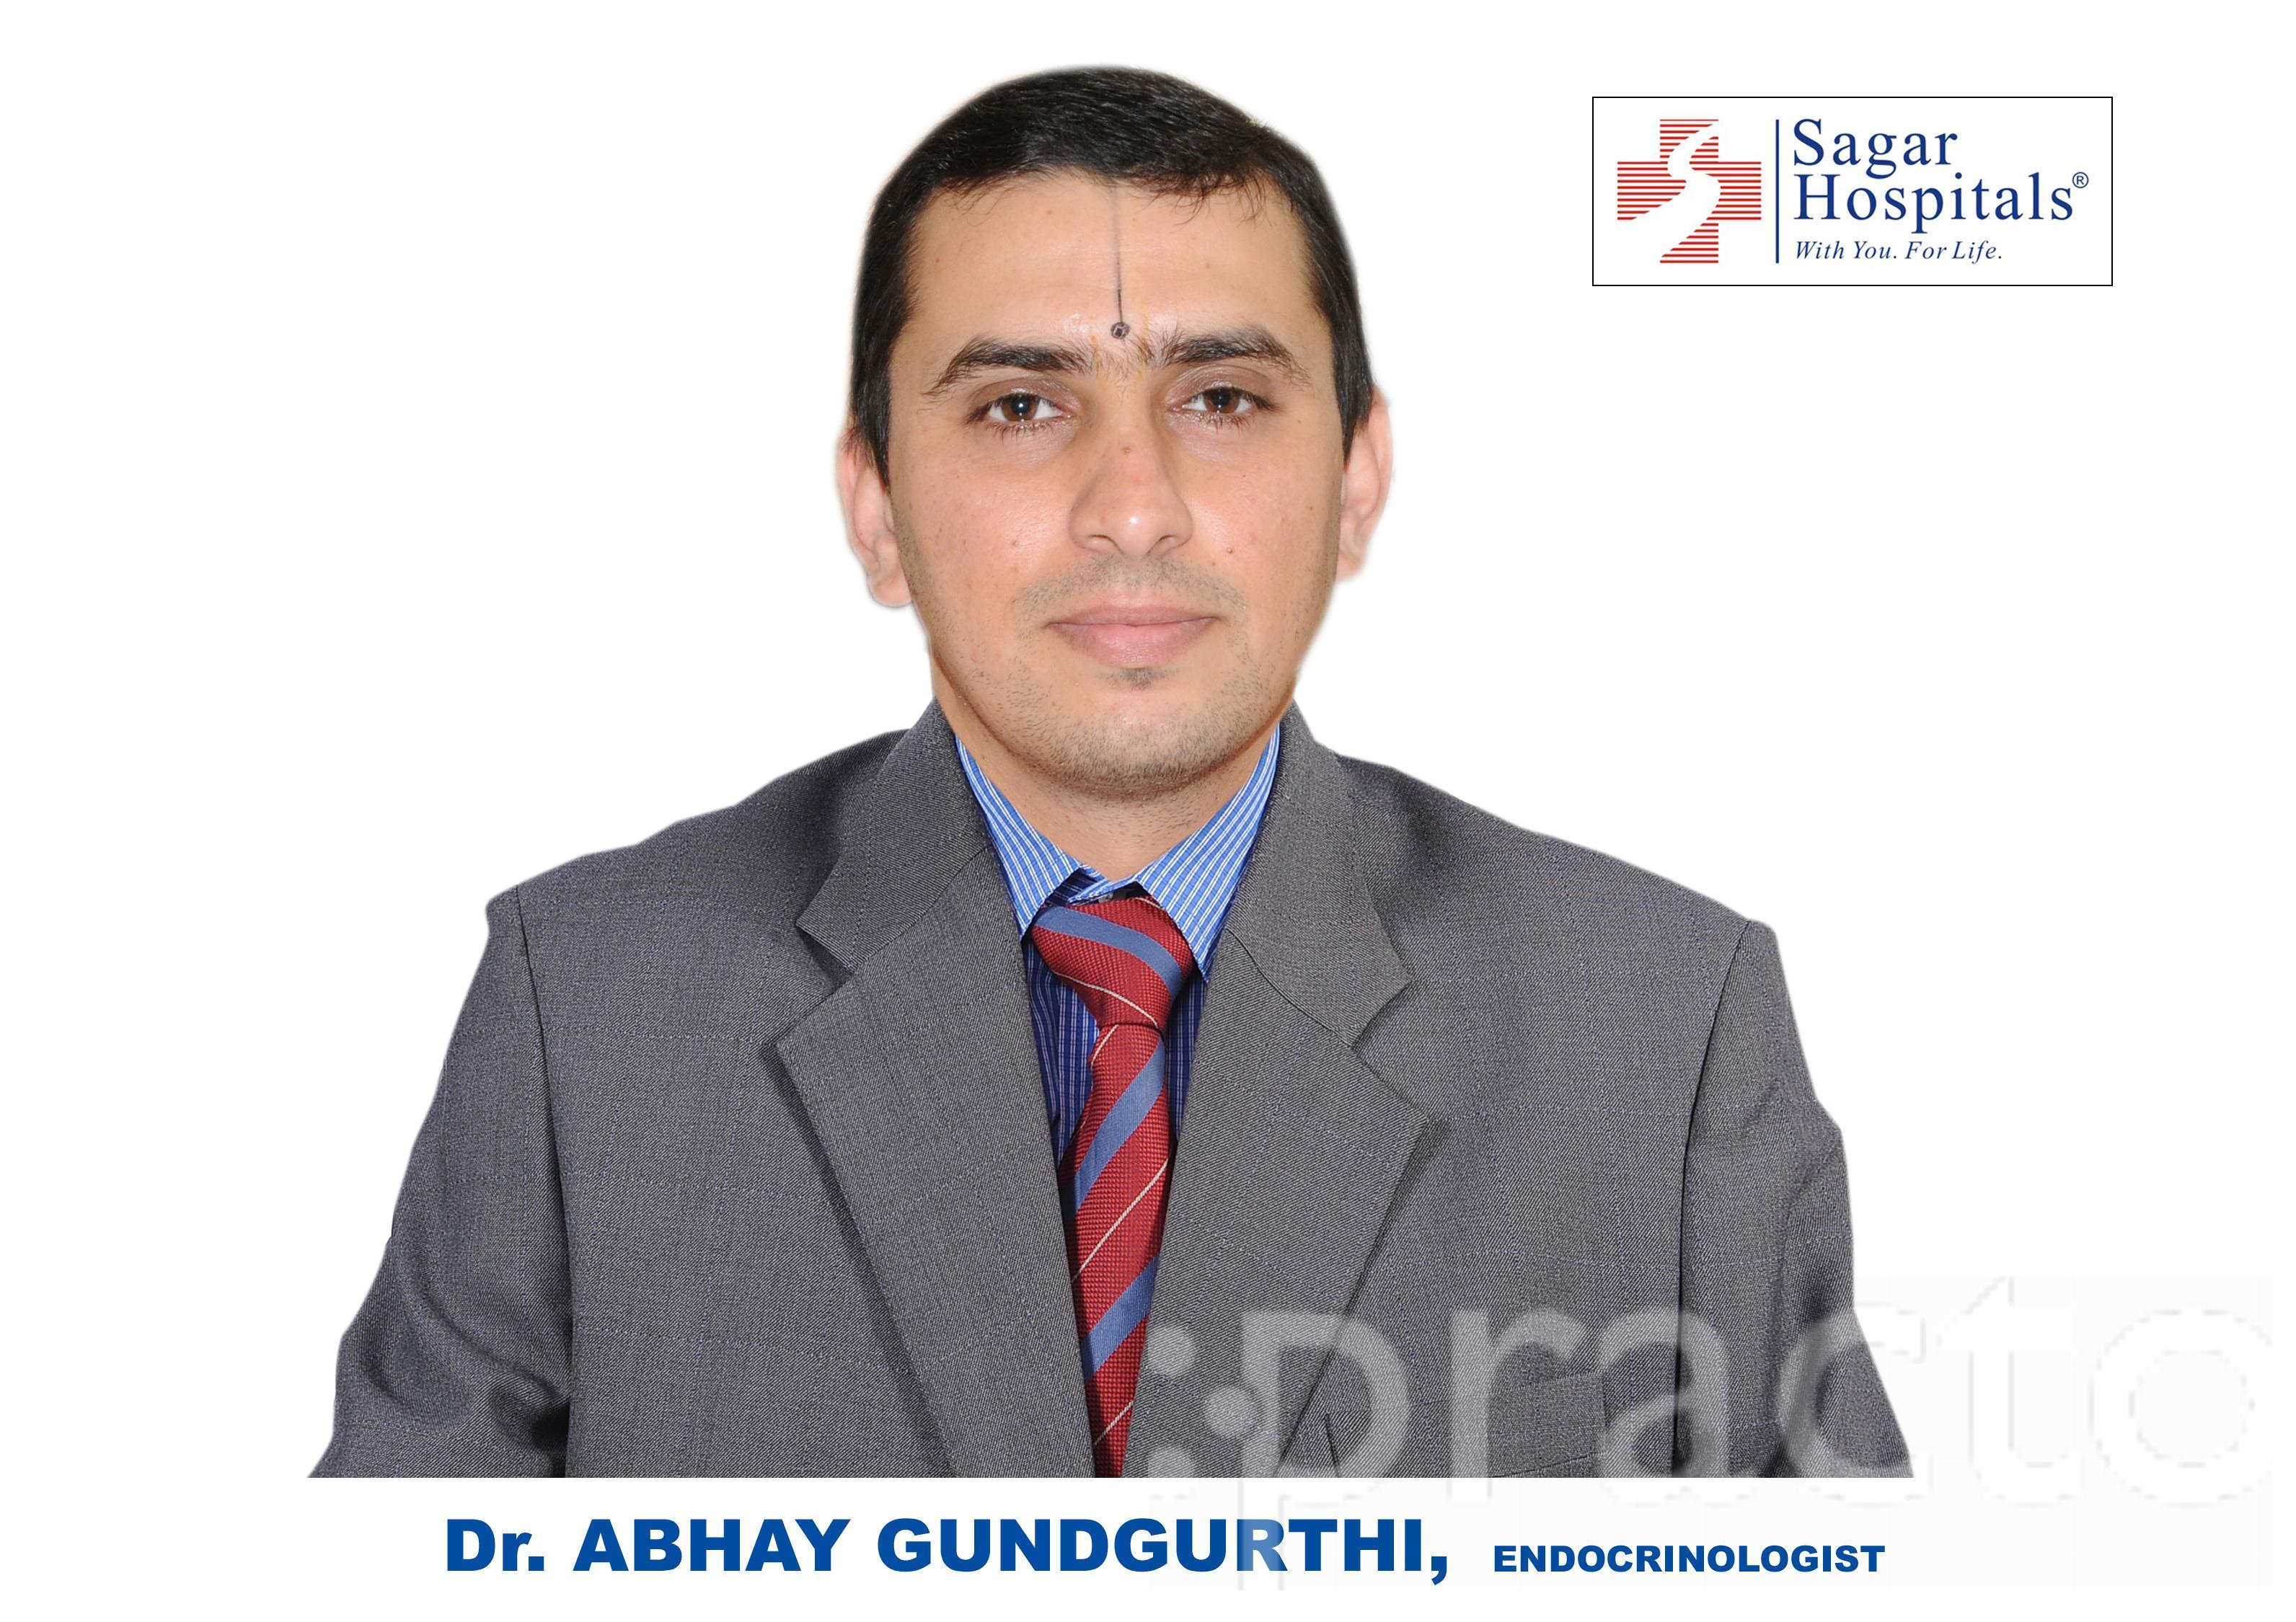 Dr. Abhay Gundgurthi - Endocrinologist